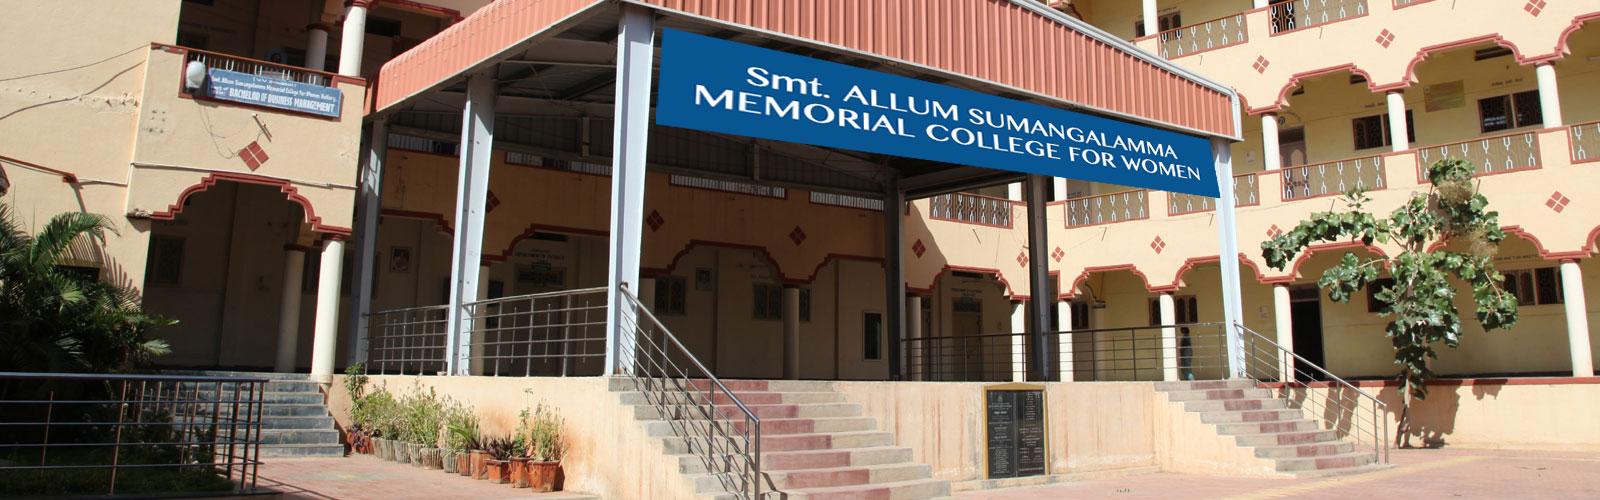 Welcome to Smt. Allum Sumangalamma Memorial College for Women